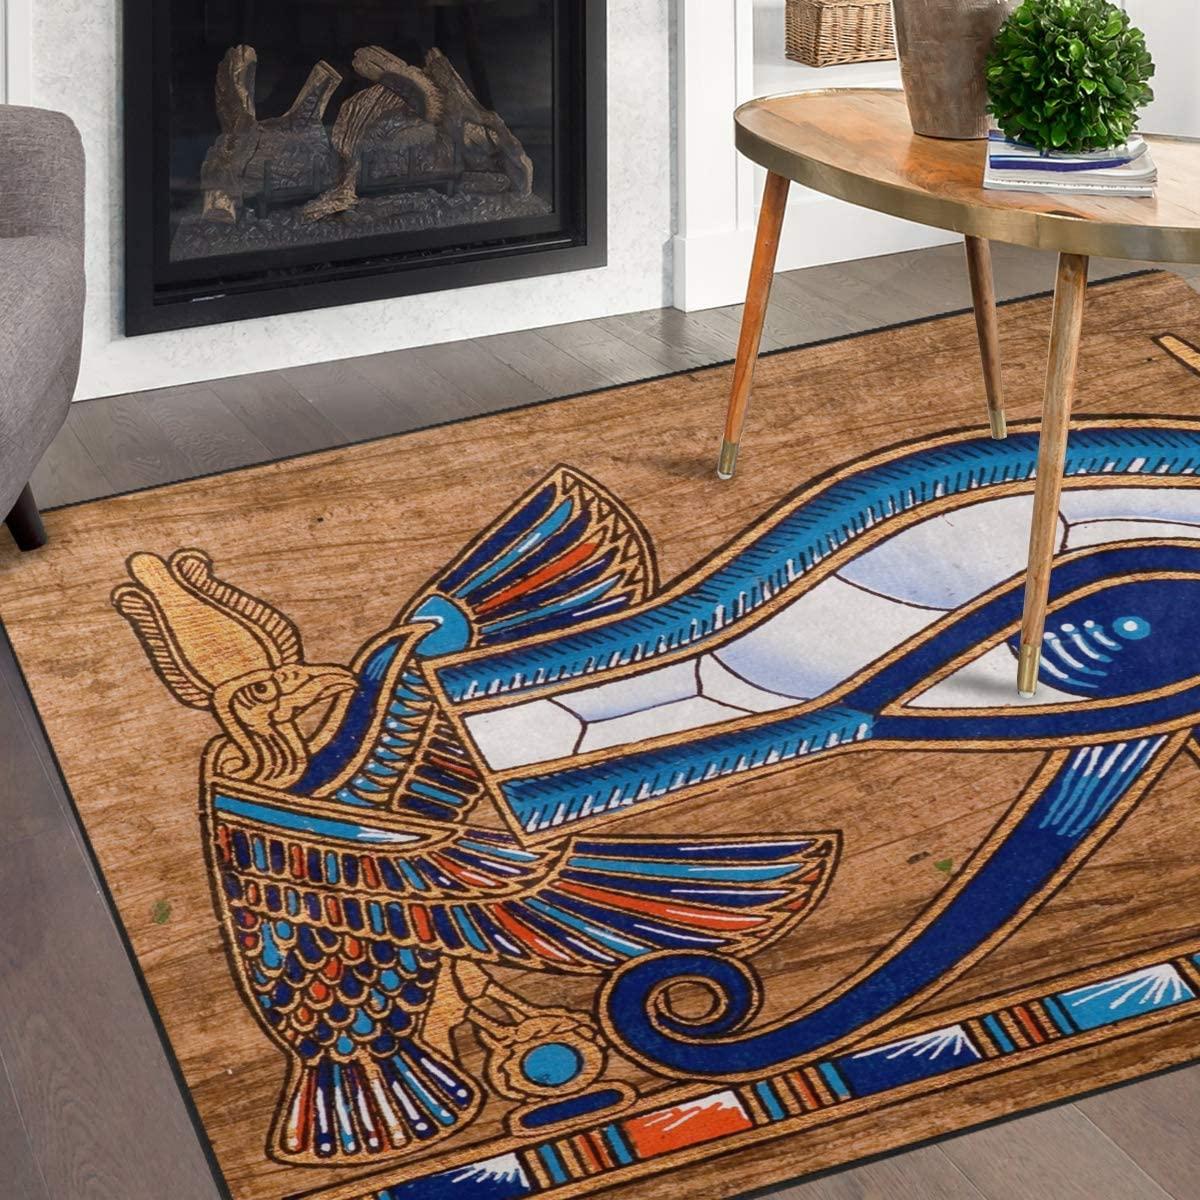 Naanle Egypt Area Rug 5'x7', Egyptian Horus Eye Polyester Area Rug Mat for Living Dining Dorm Room Bedroom Home Decorative